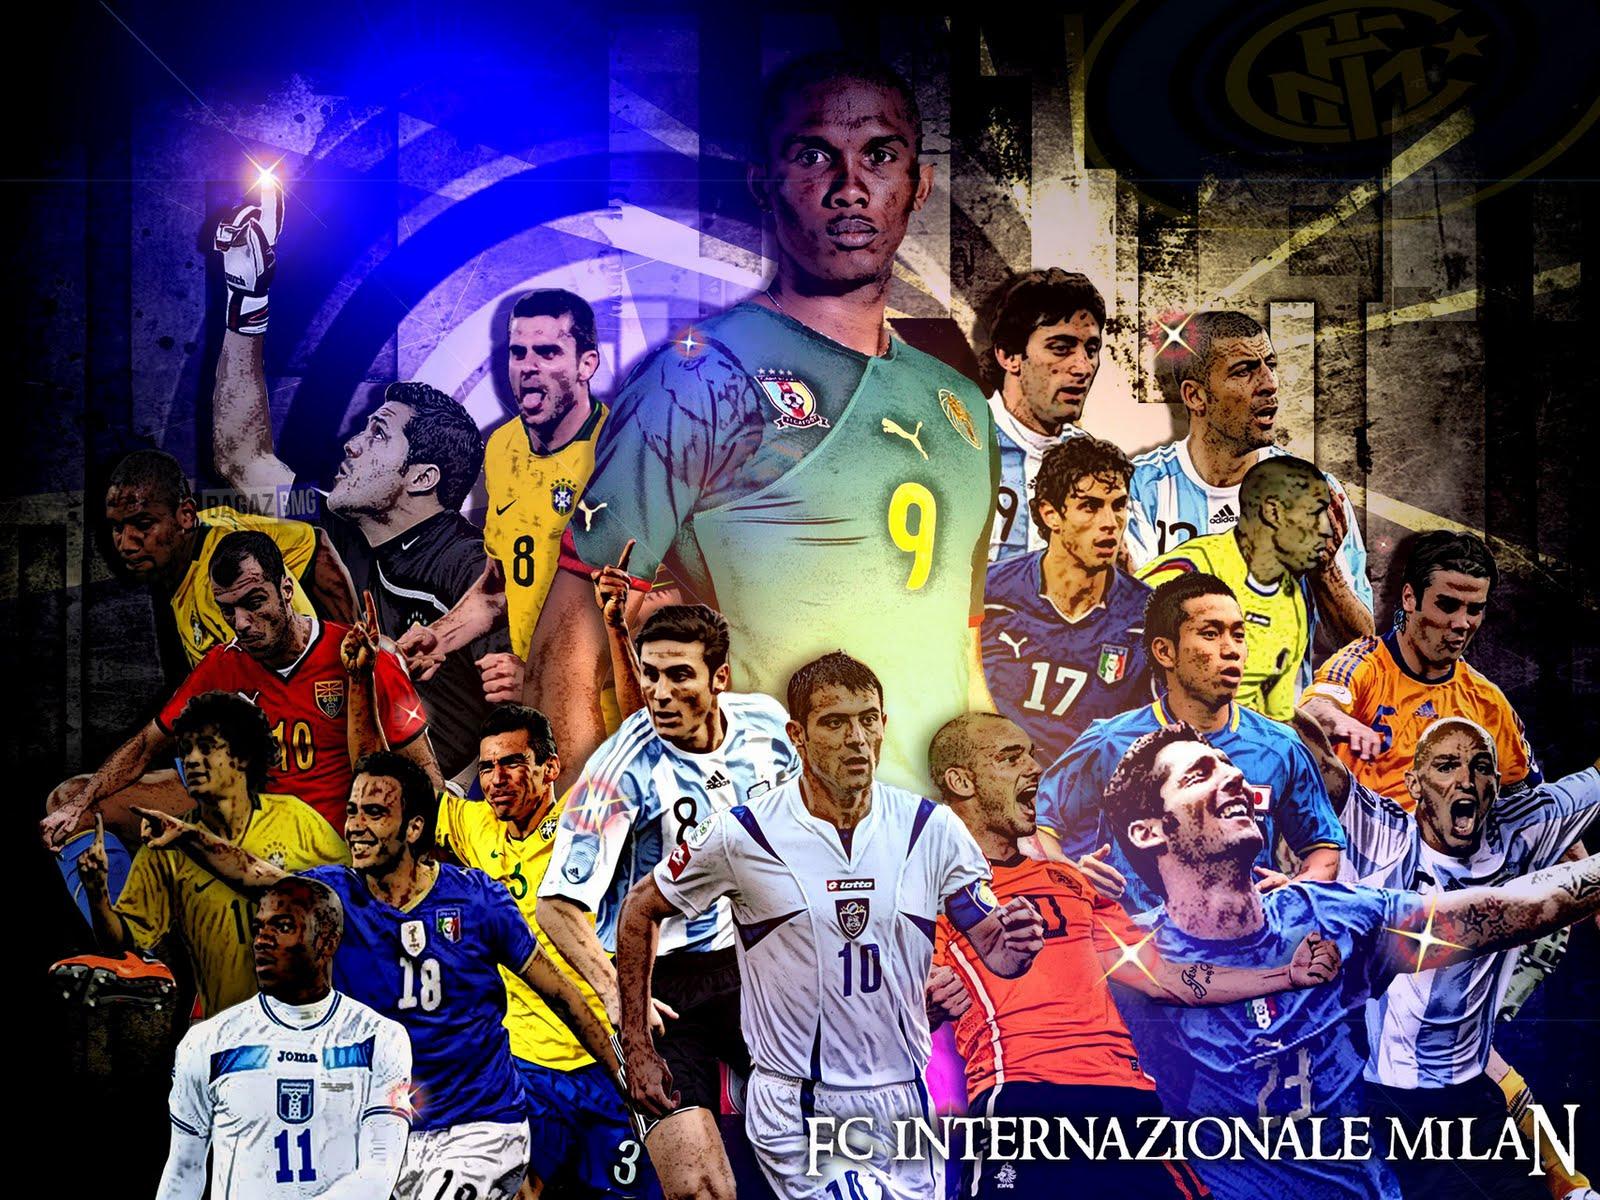 http://1.bp.blogspot.com/-1qoo4x7oJp4/TcOXuhE7wyI/AAAAAAAACis/kFO2WIEGnO8/s1600/Champions+League+2011+Wallpaper2.jpg